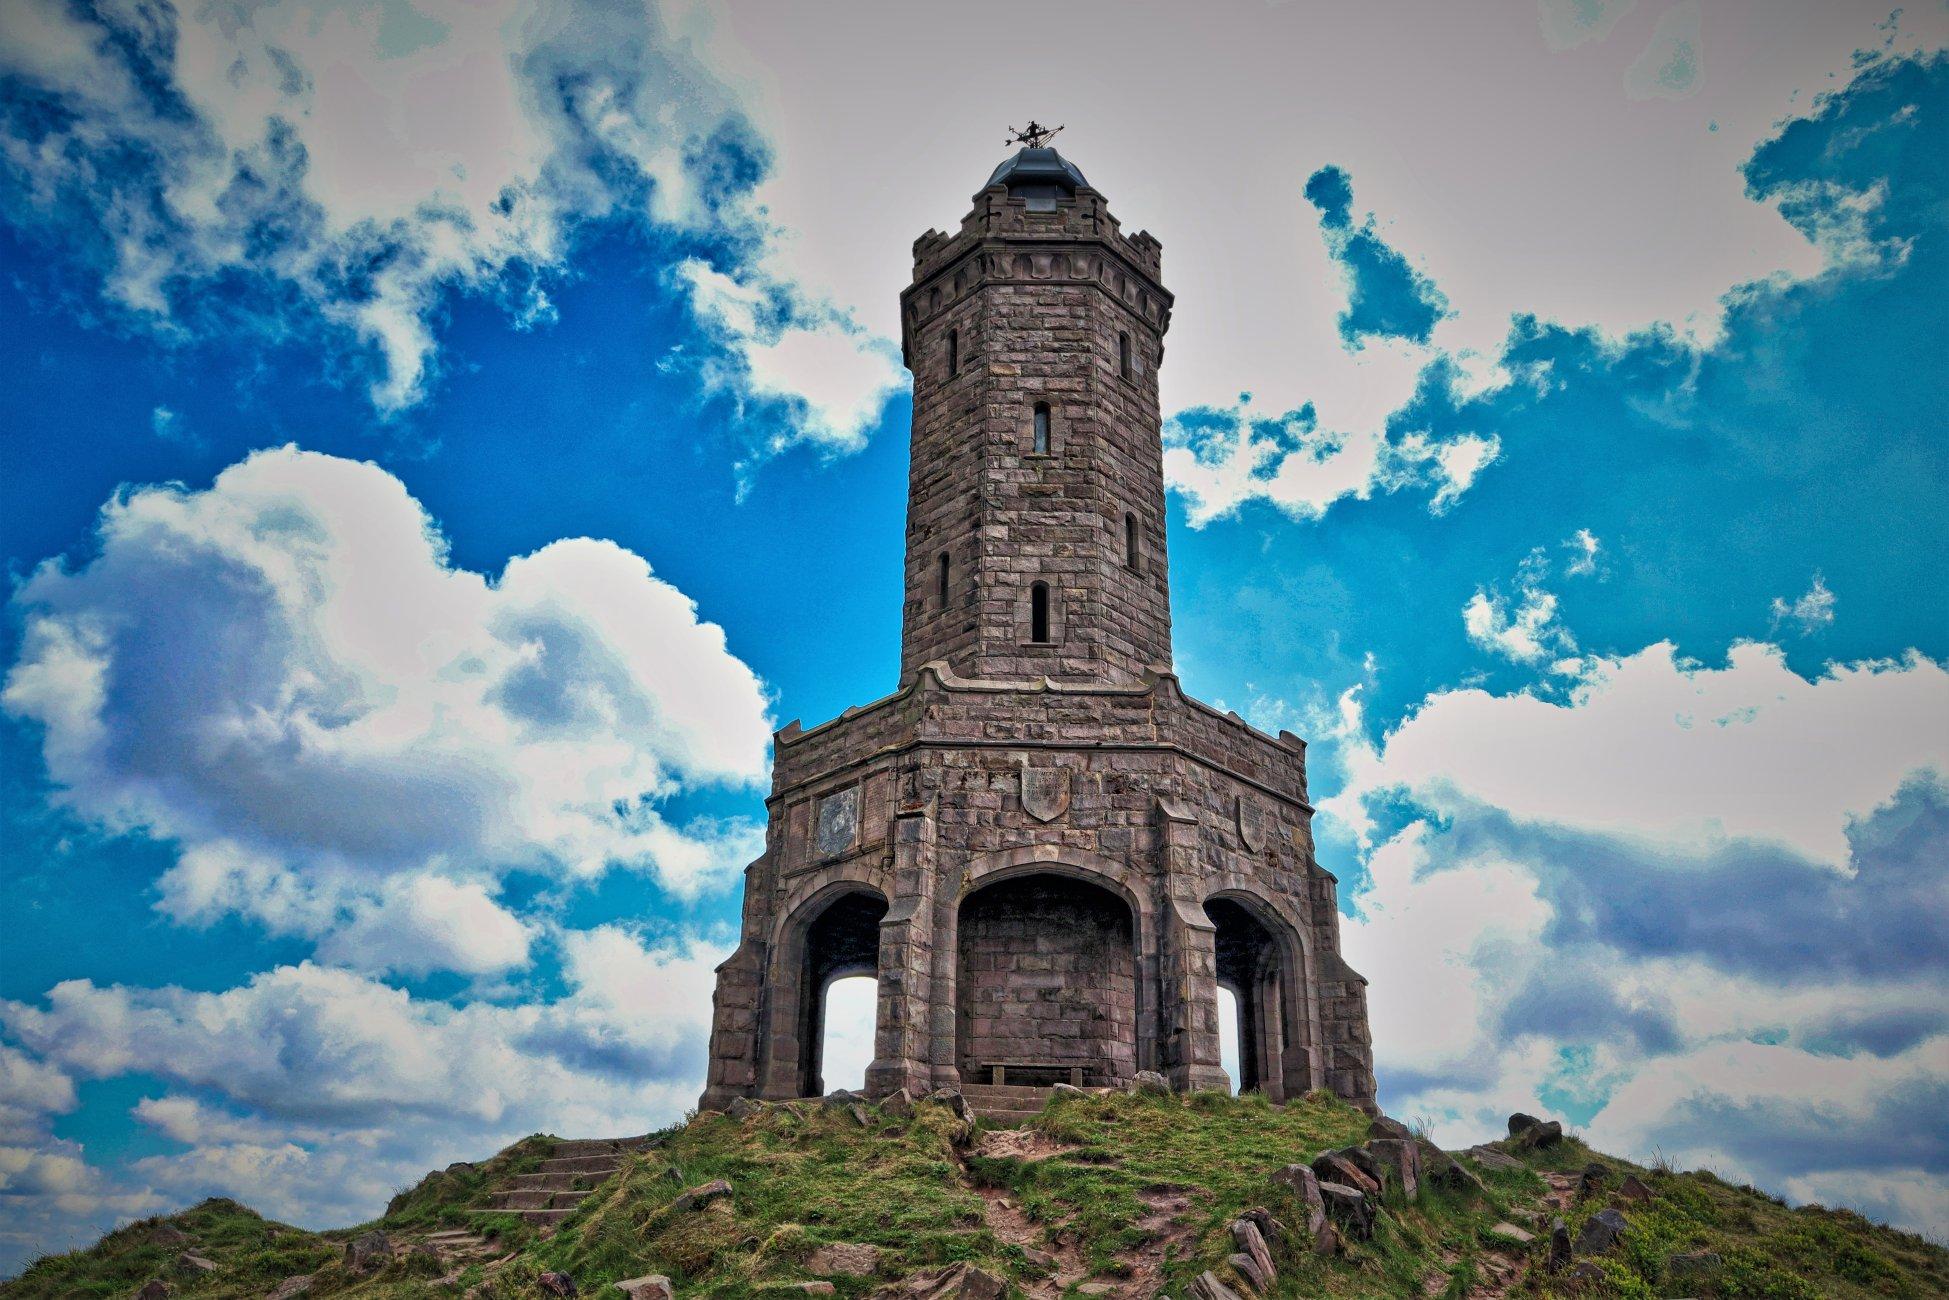 Dan Dare's Rocket (Darwen Tower)